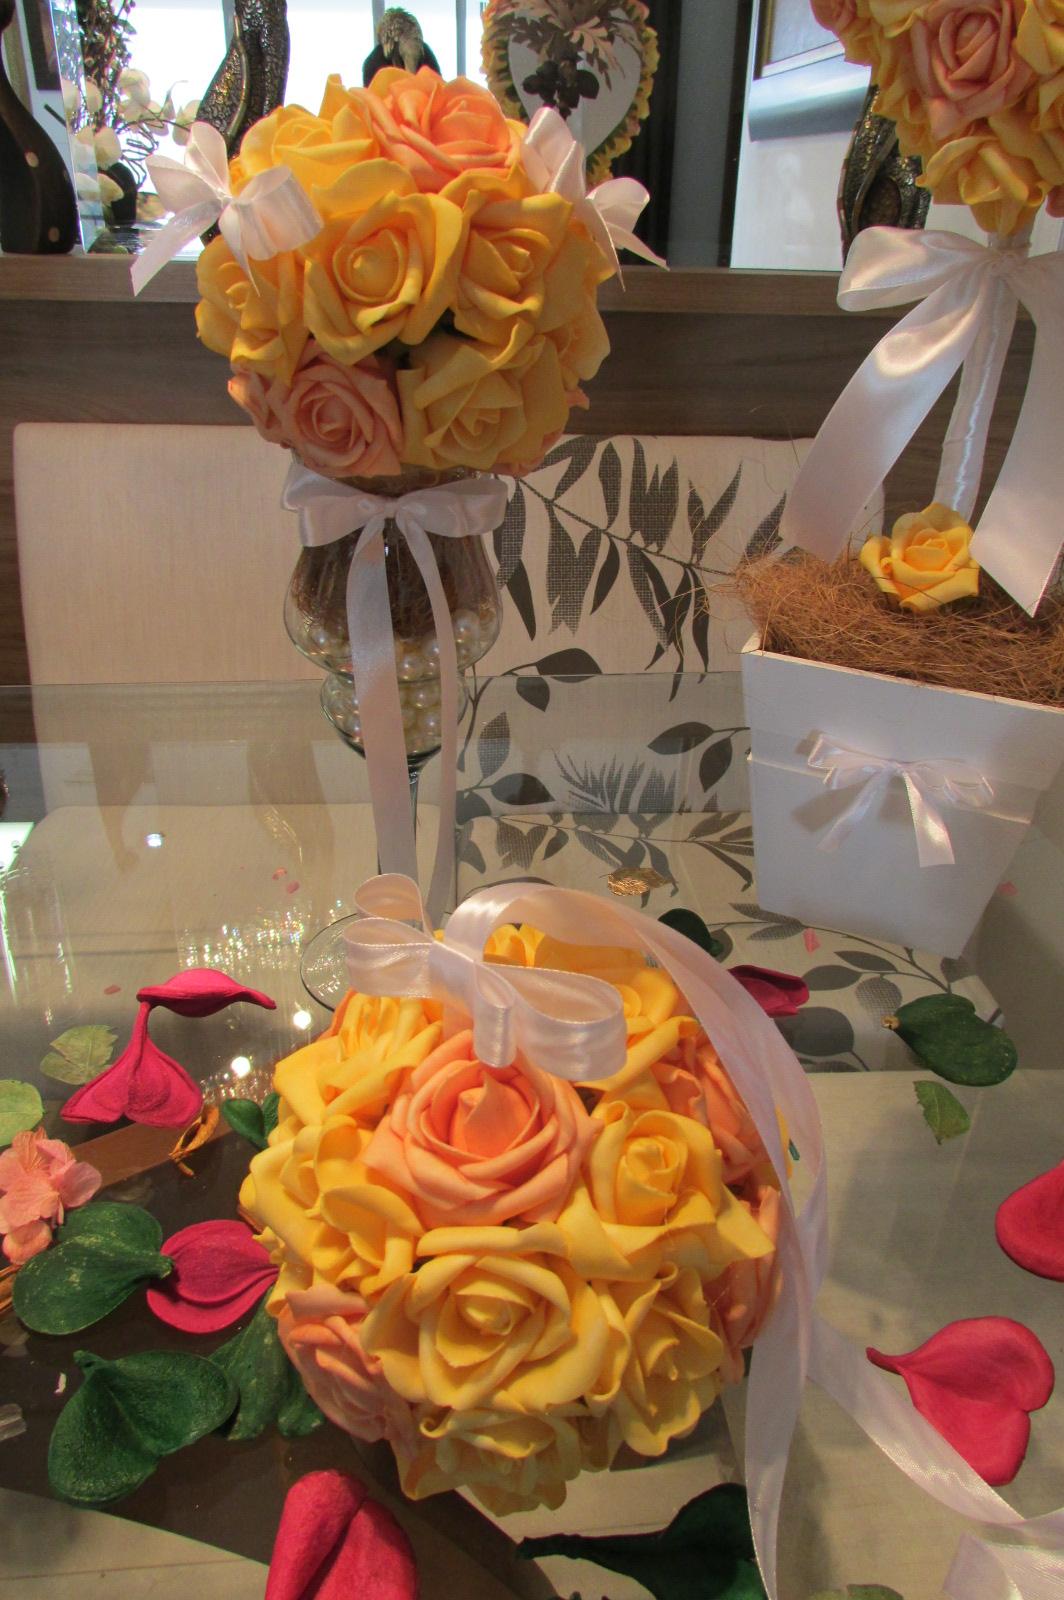 kit decoracao casamento : kit decoracao casamento:kit decoracao amarela para festas vi decoracao casamento kit decoracao